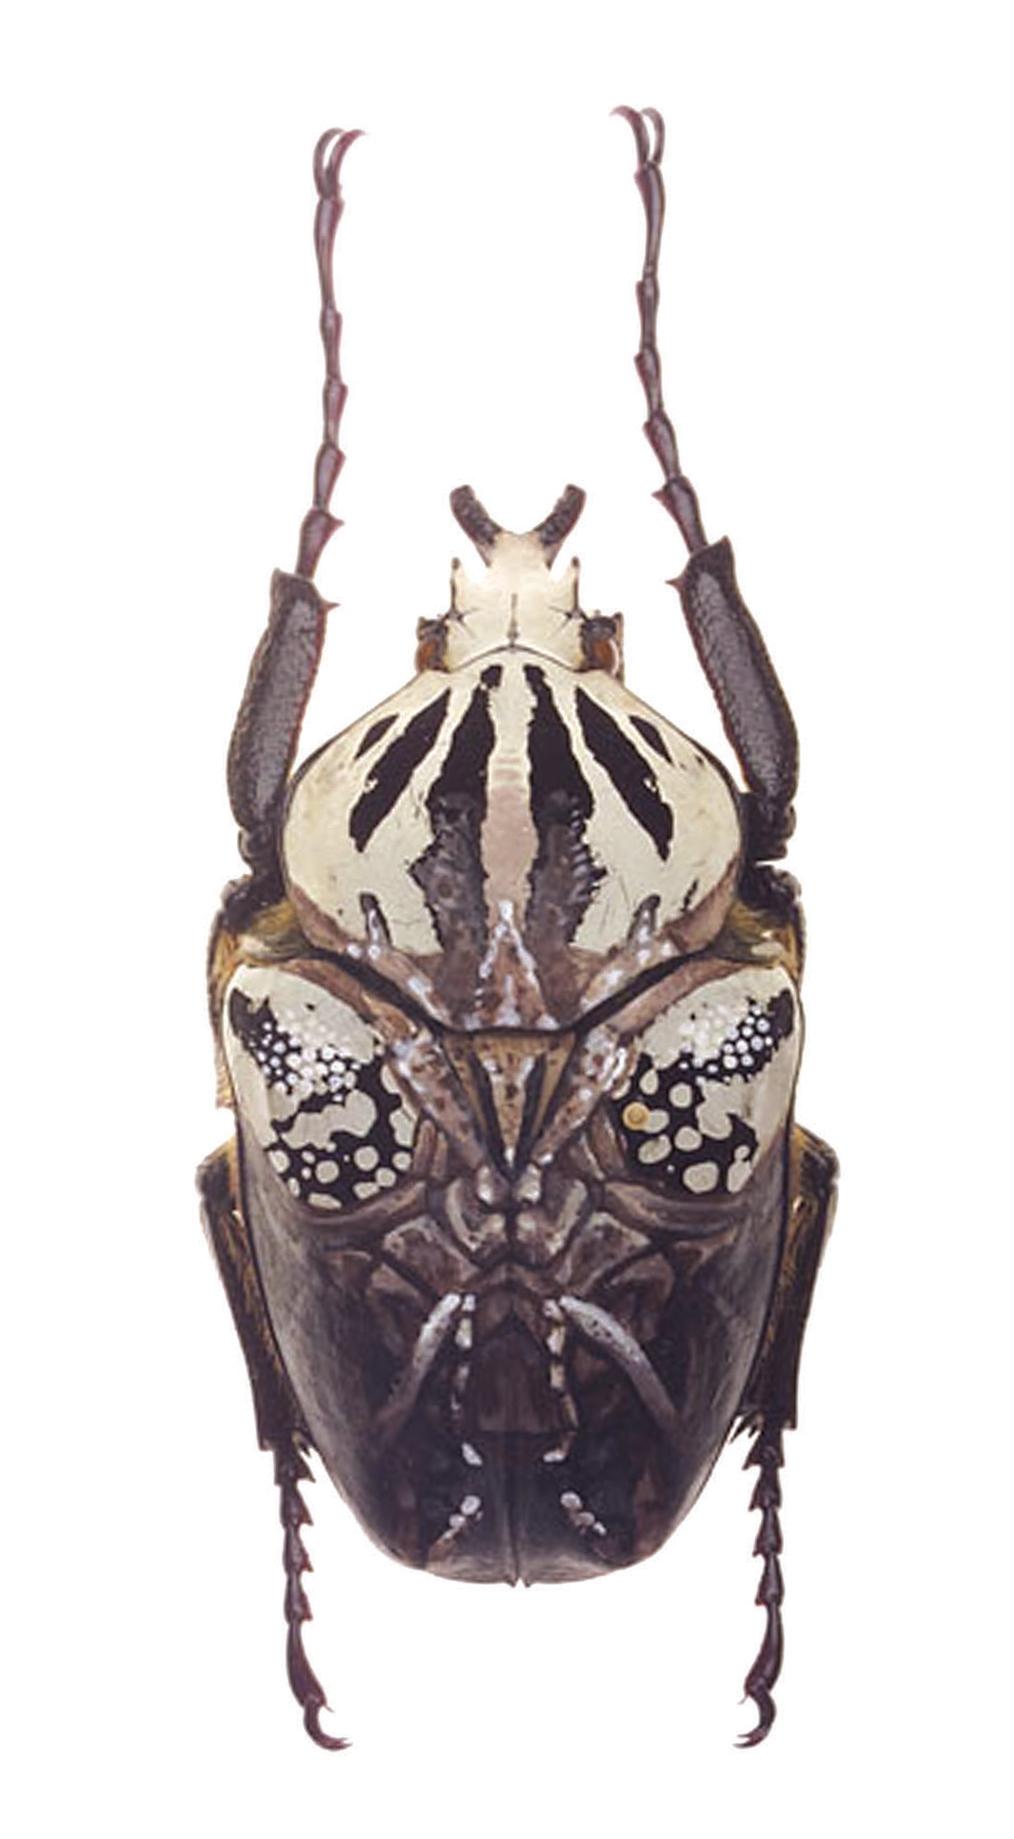 "Mantis-Goliath.  2005 - acrylic on beetle. 3"" x 1.5""."